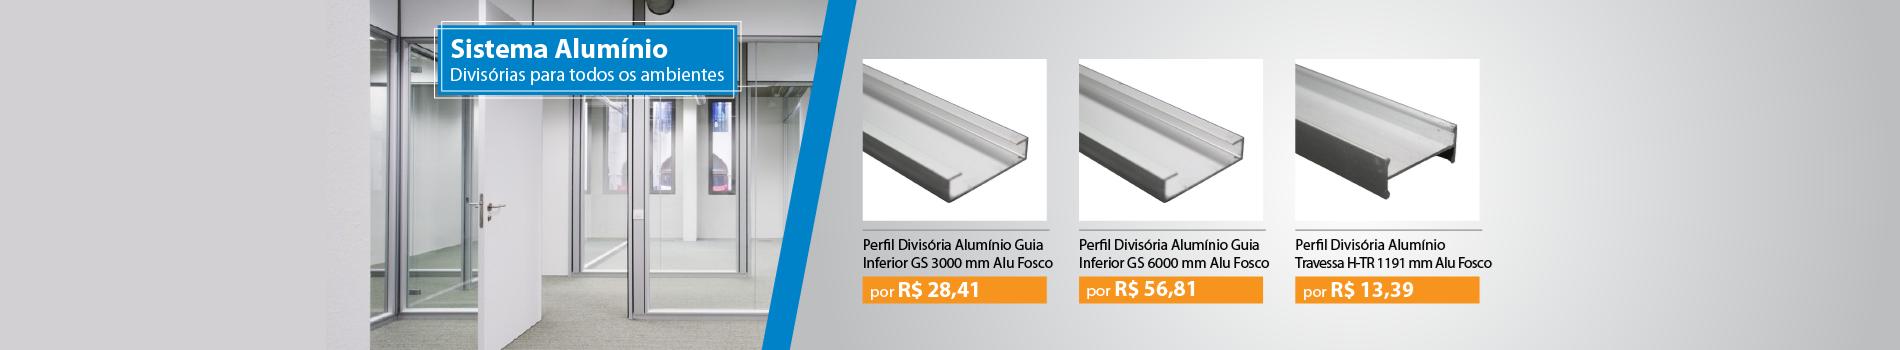 http://www.artesana.com.br/sistemaaluminio